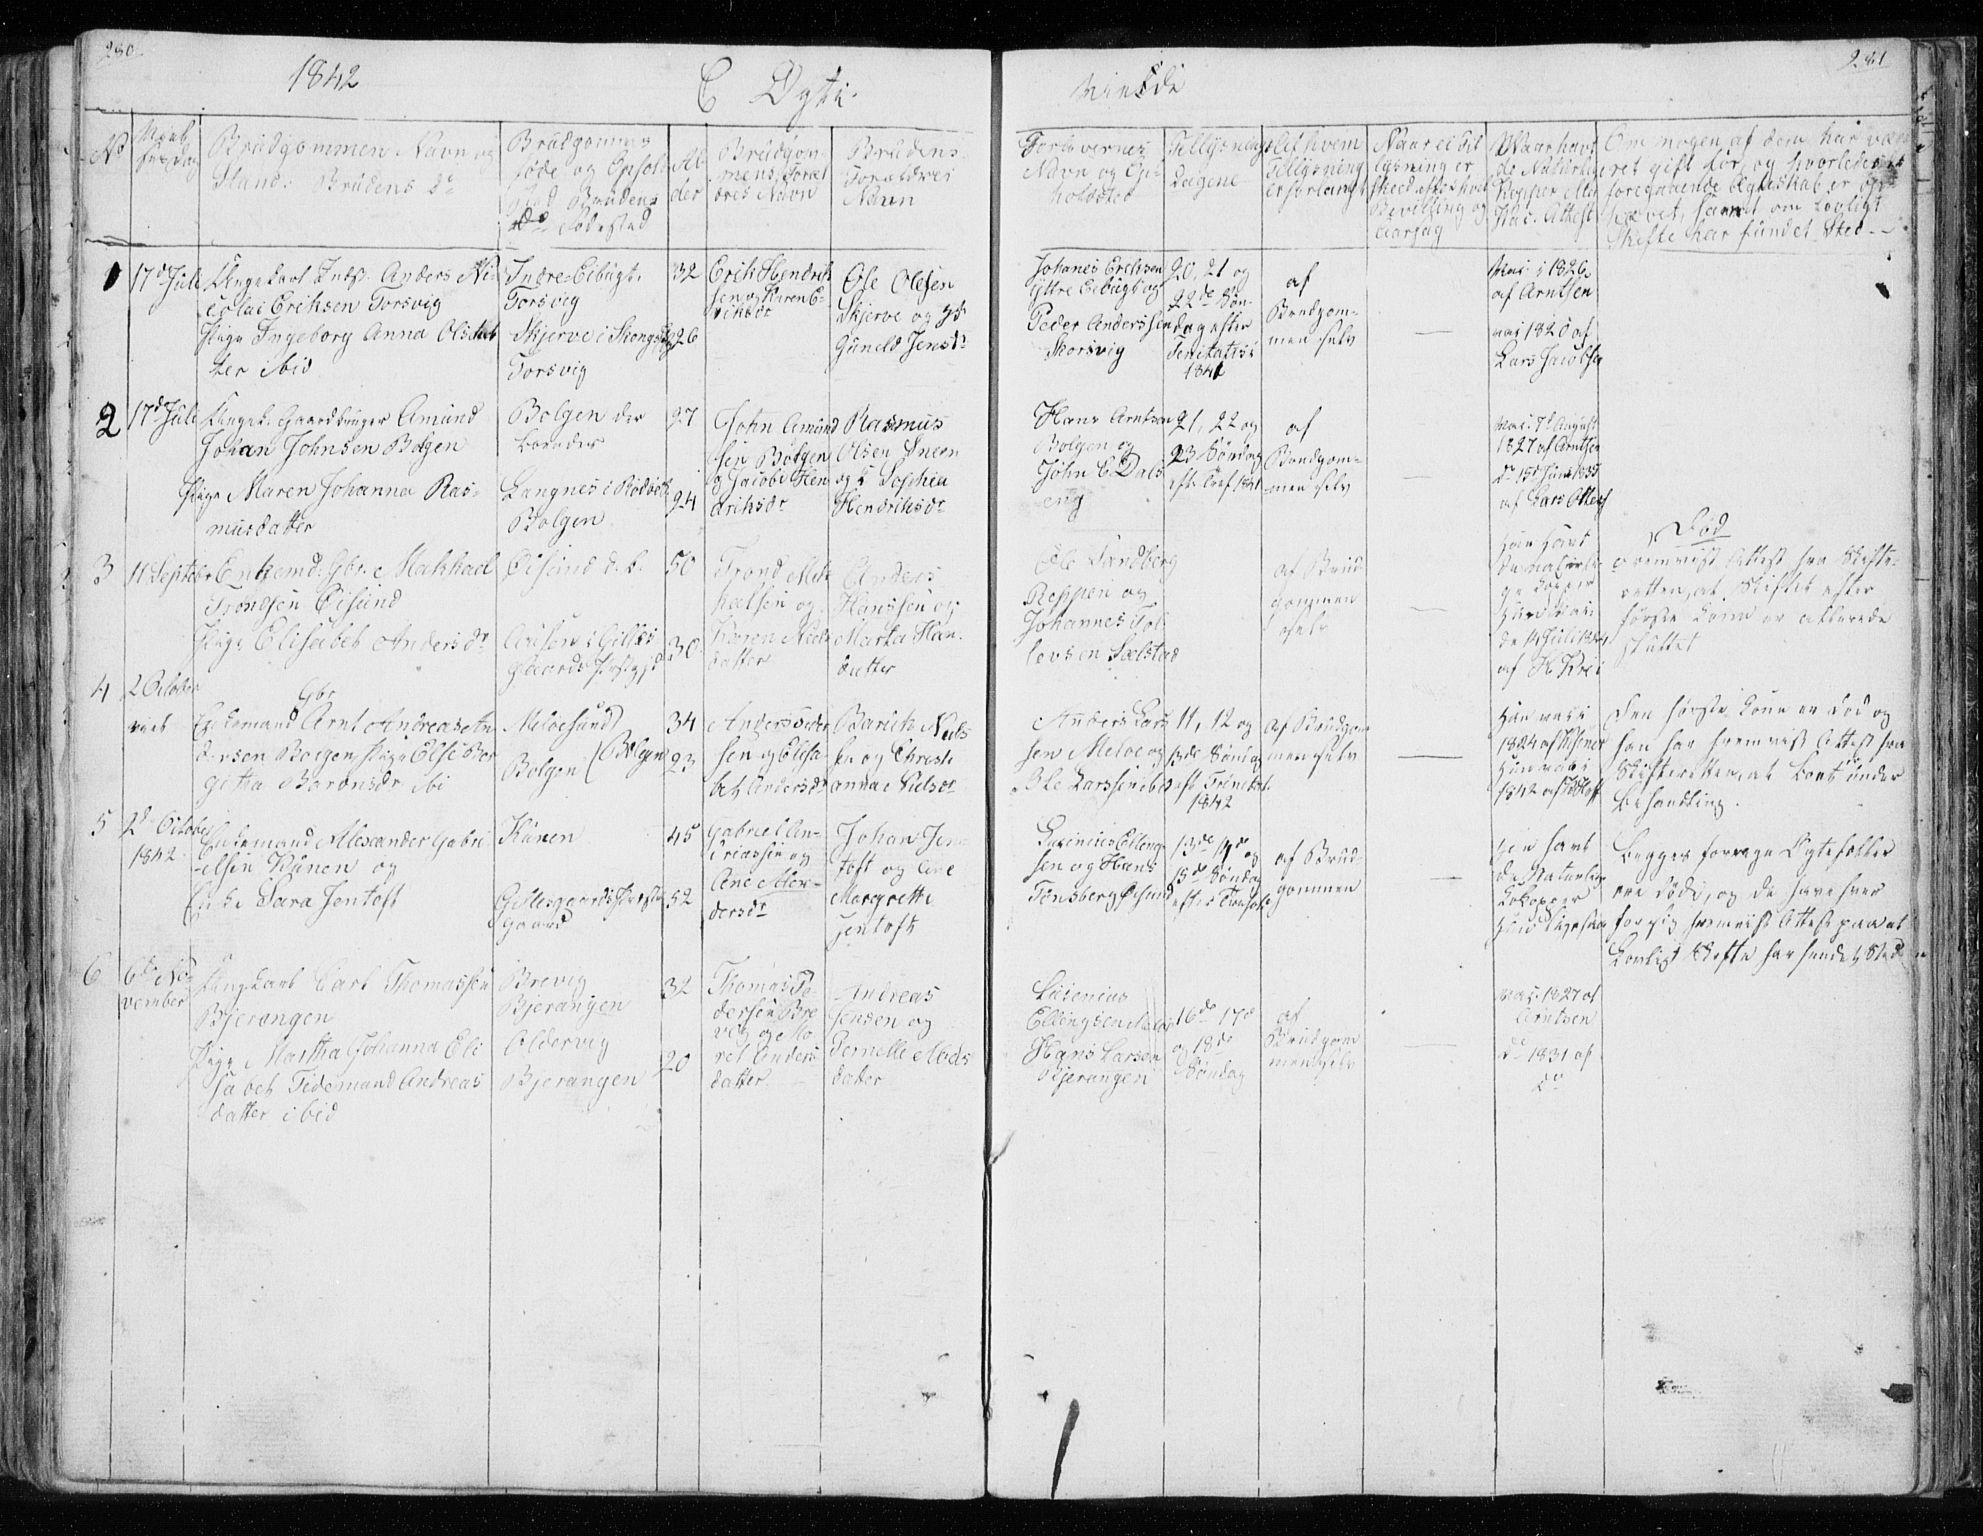 SAT, Ministerialprotokoller, klokkerbøker og fødselsregistre - Nordland, 843/L0632: Klokkerbok nr. 843C01, 1833-1853, s. 280-281